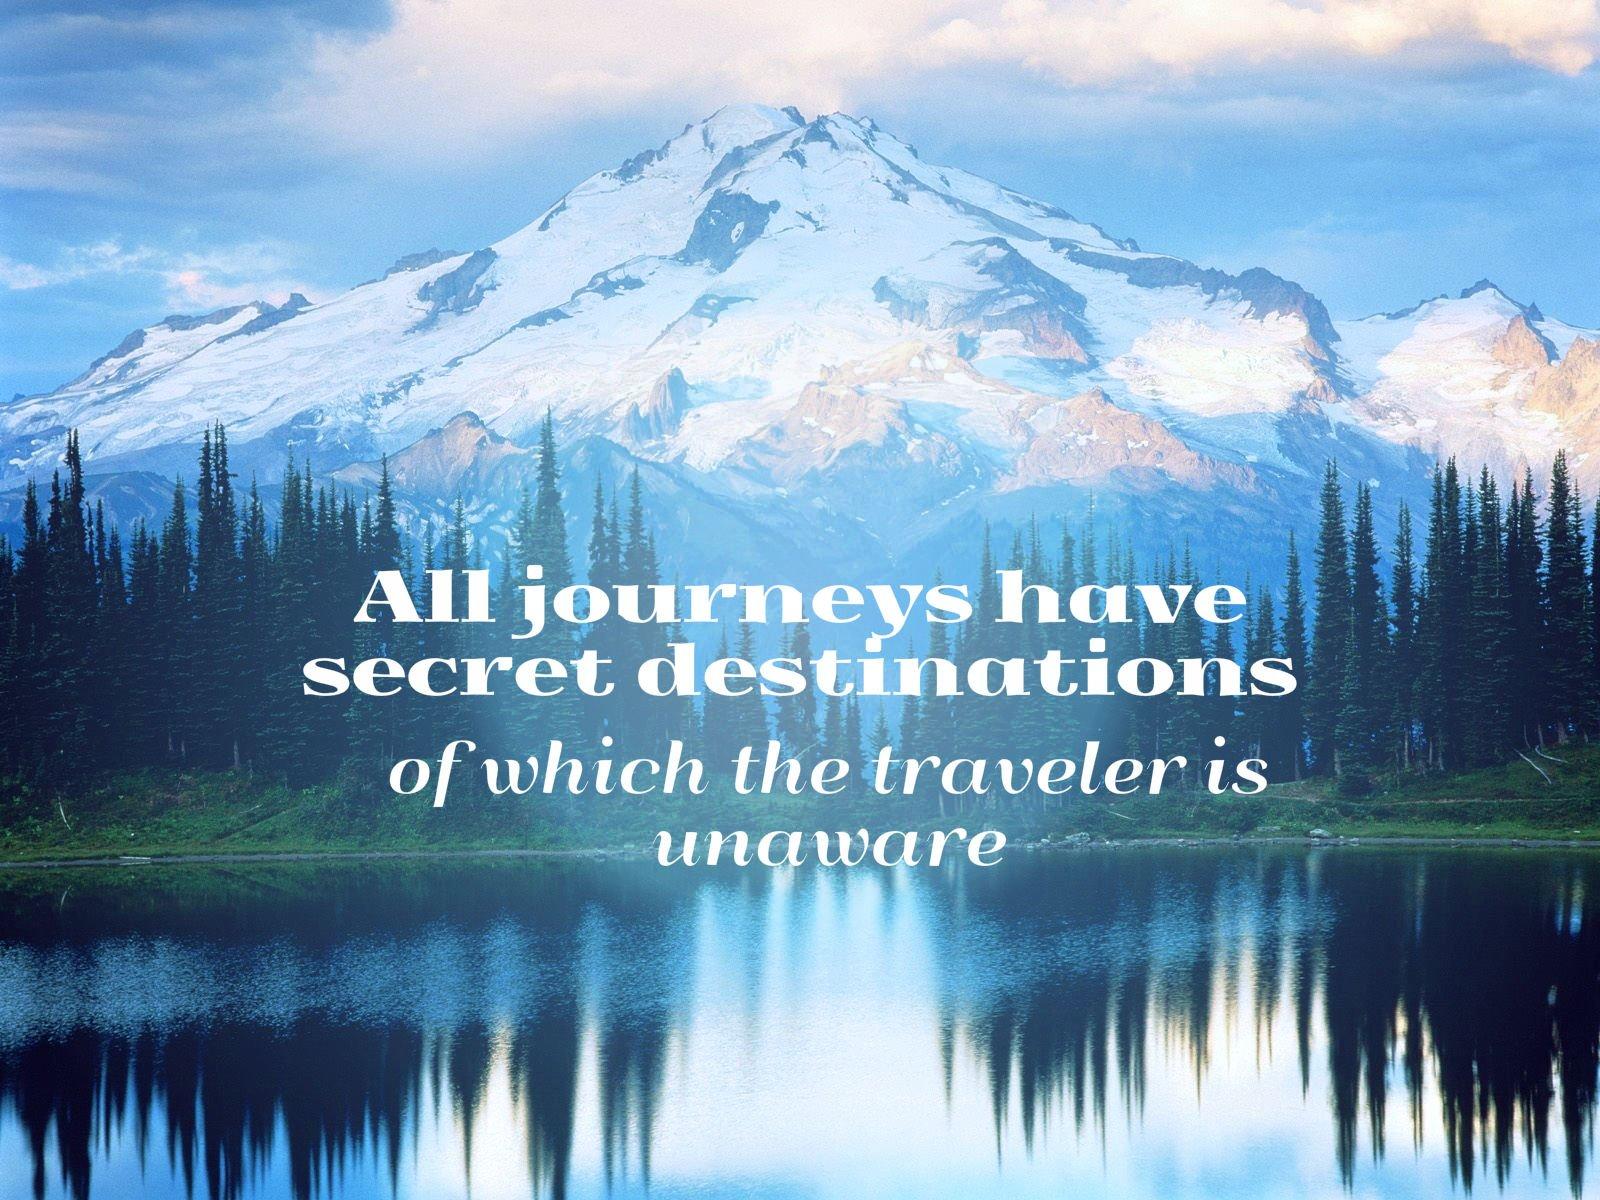 Travel quotes (5)